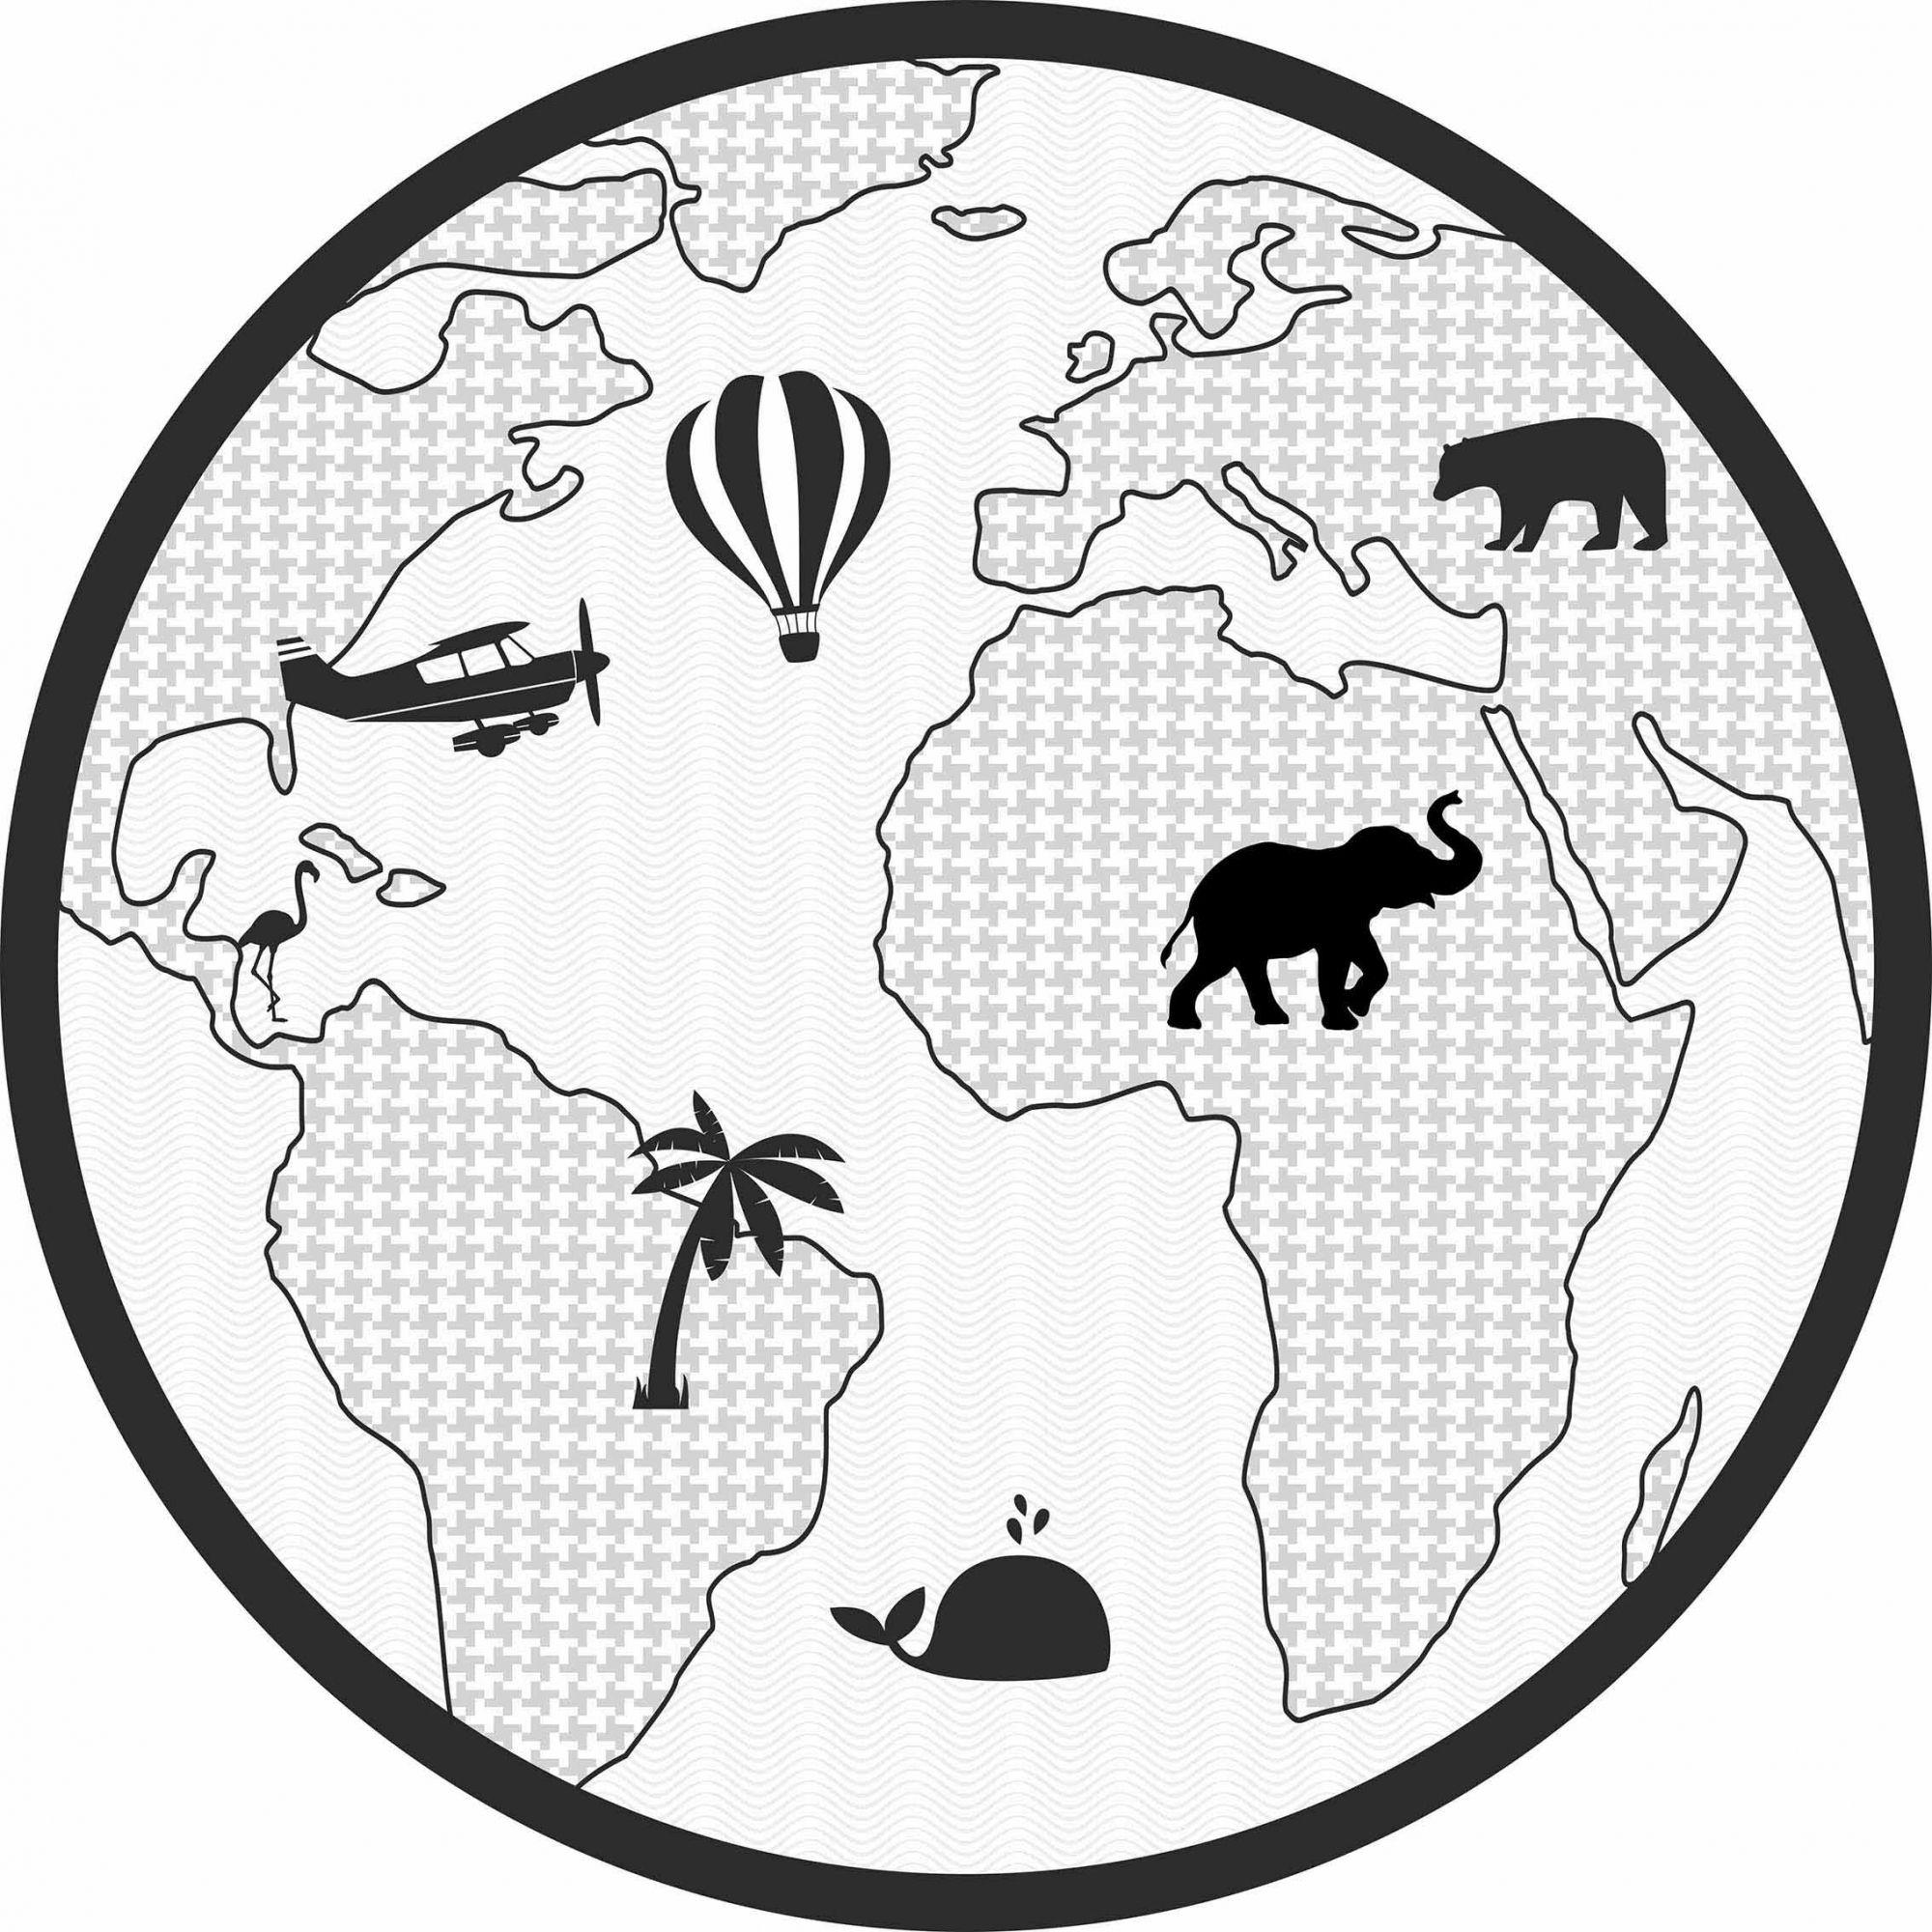 Tapete Vinílico Infantil Mapa Preto e Branco